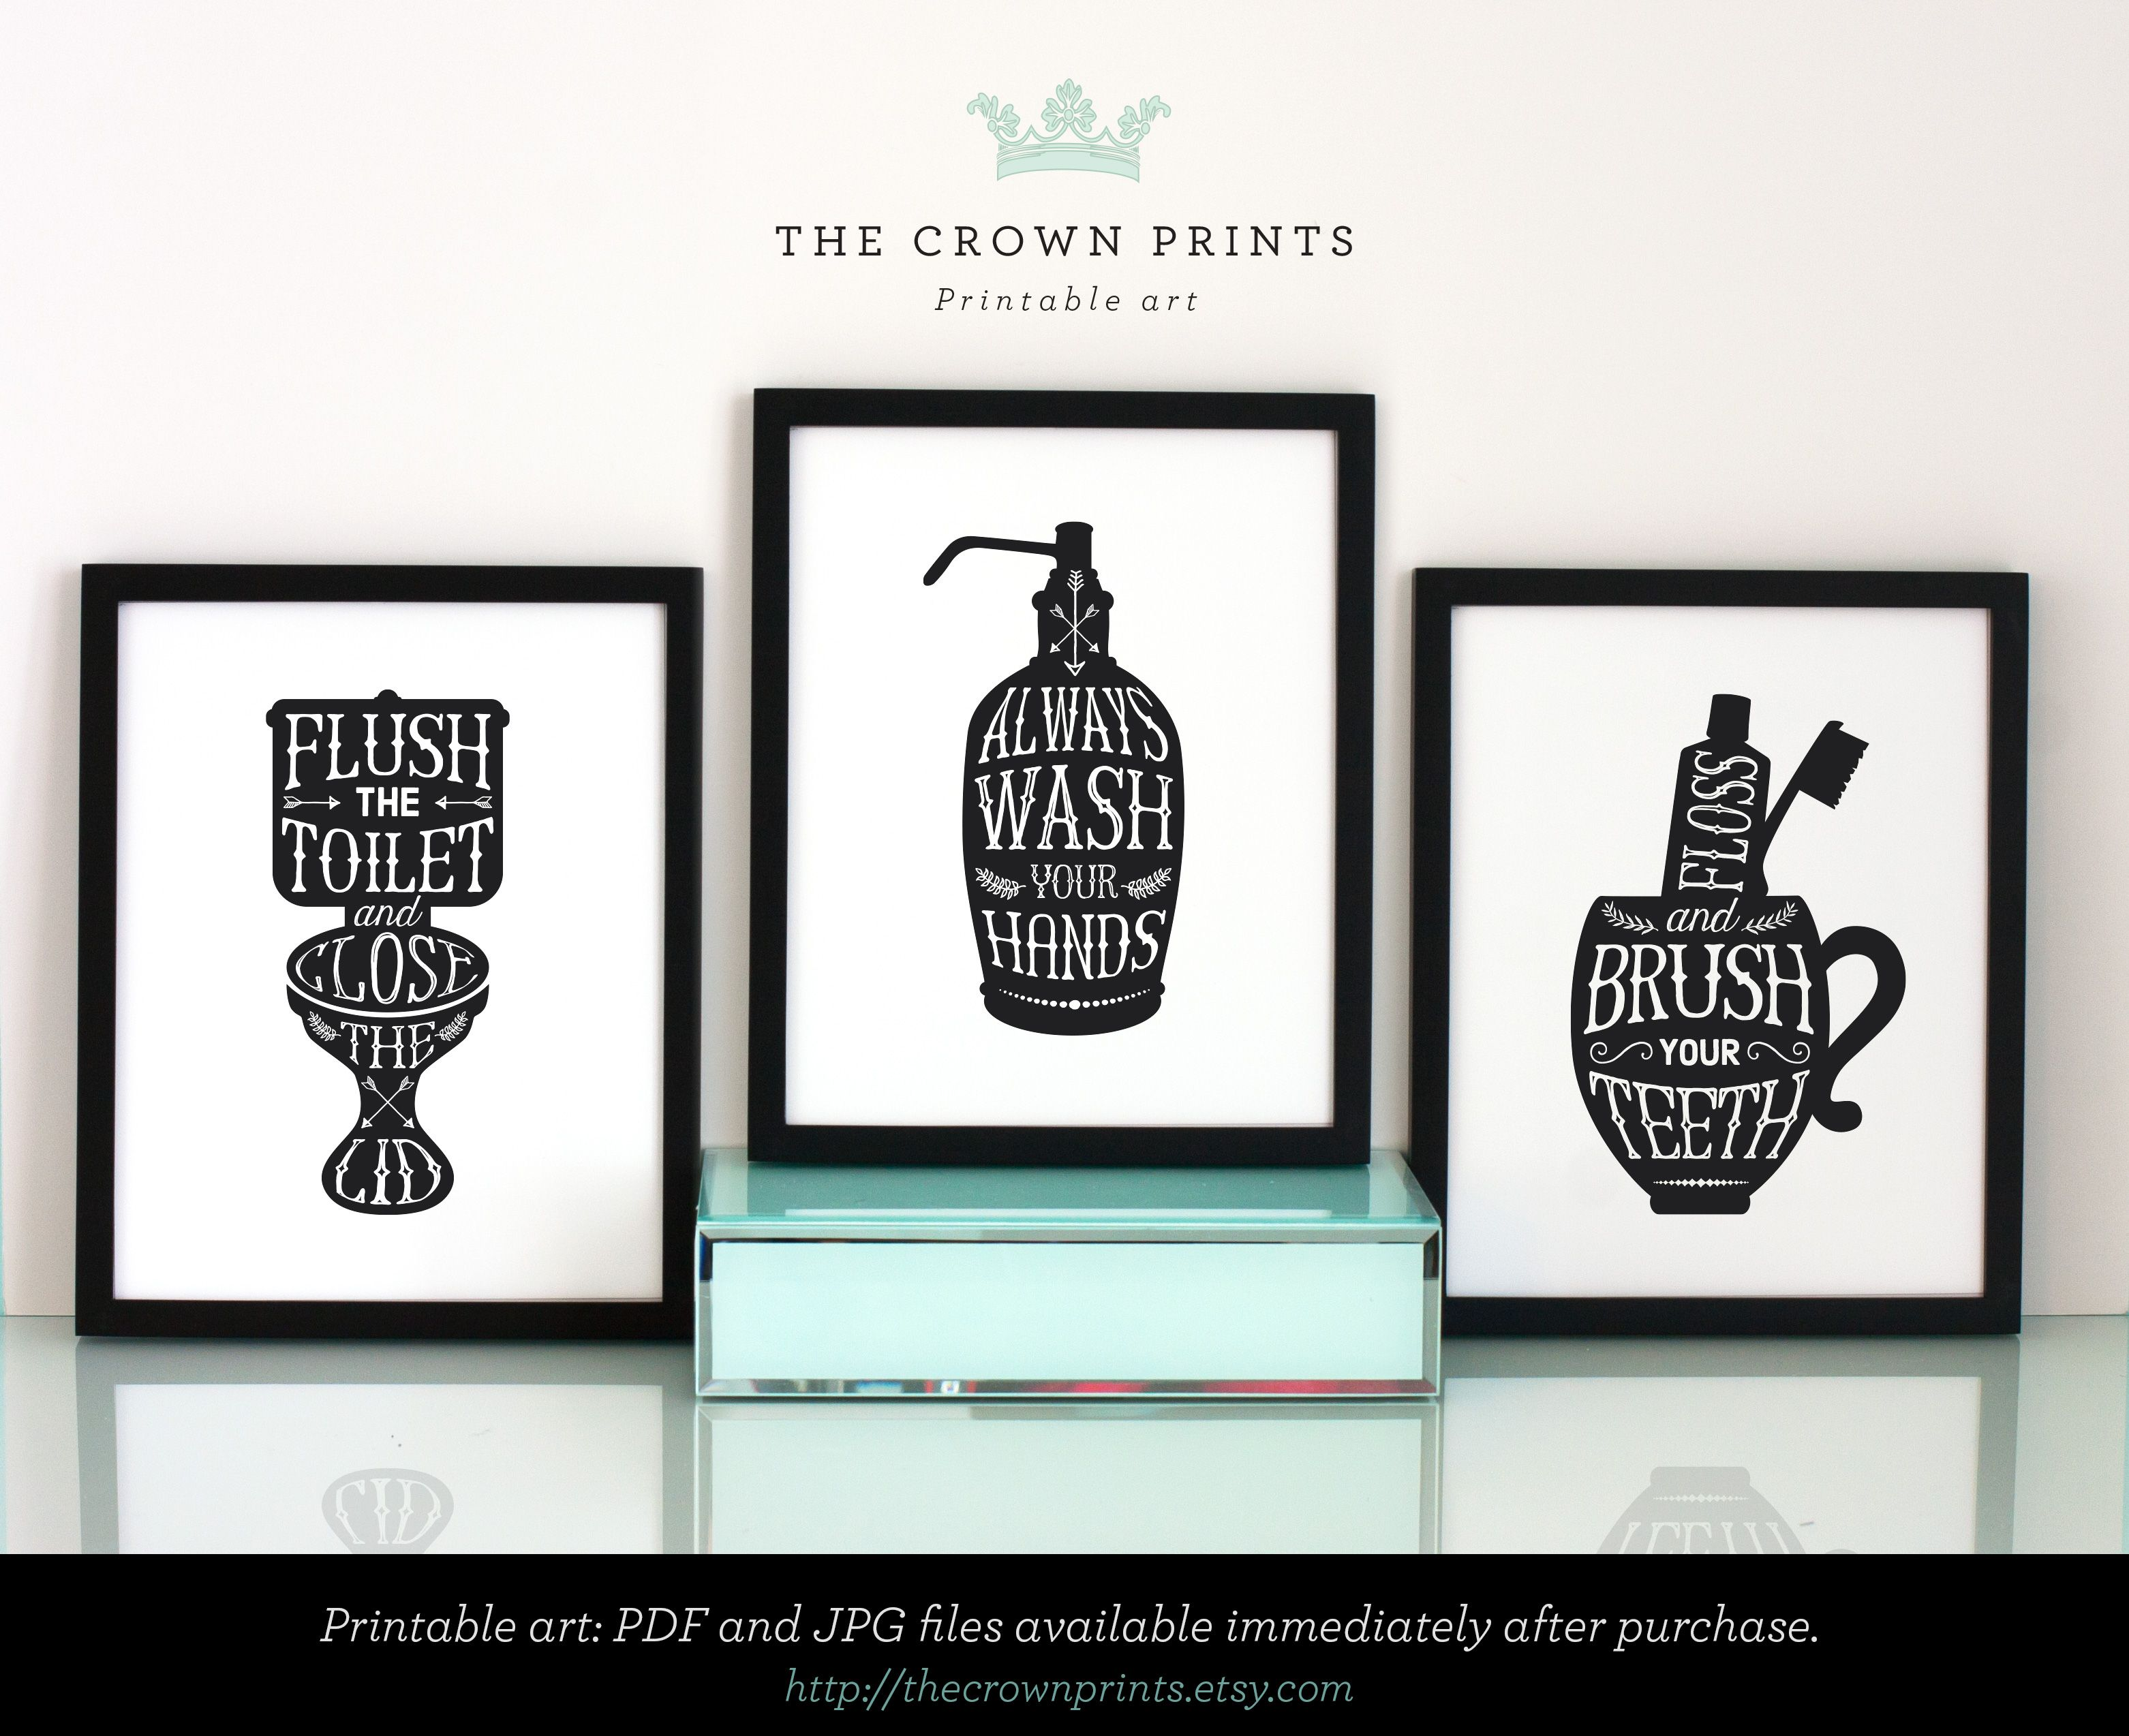 Bathroom wall decor, PRINTABLE ART, Gallery prints set of ...